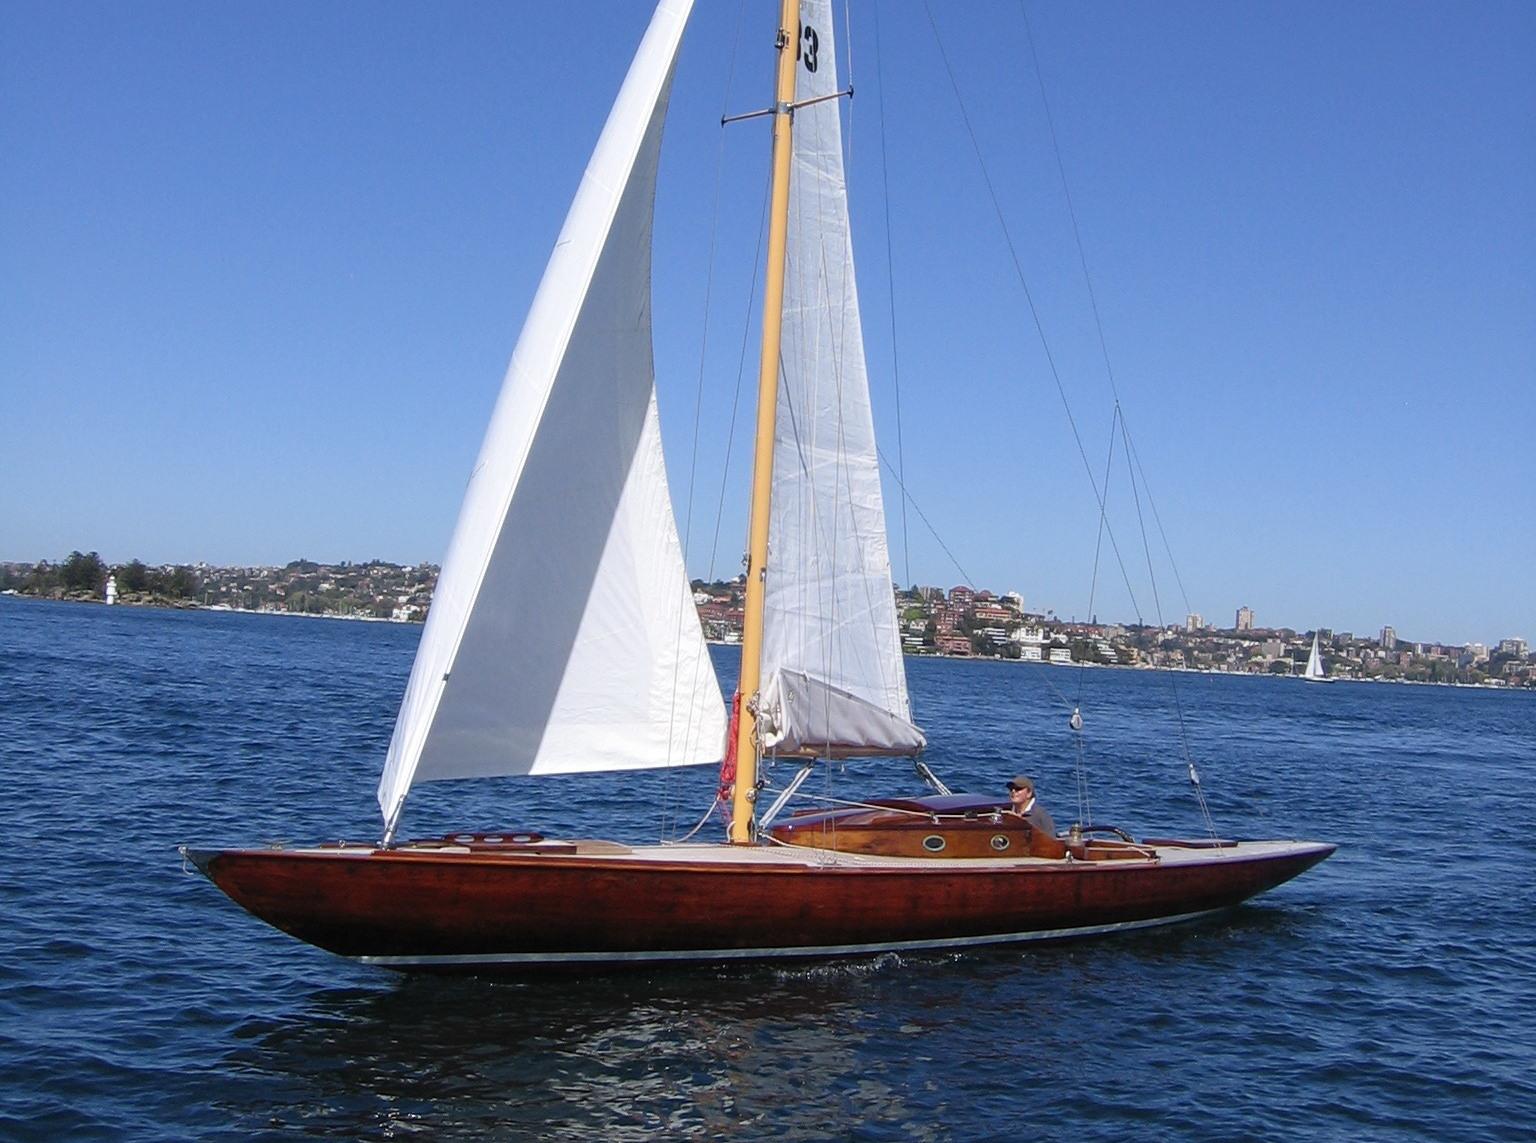 30sqm Classic Racing Yacht Eco Boats